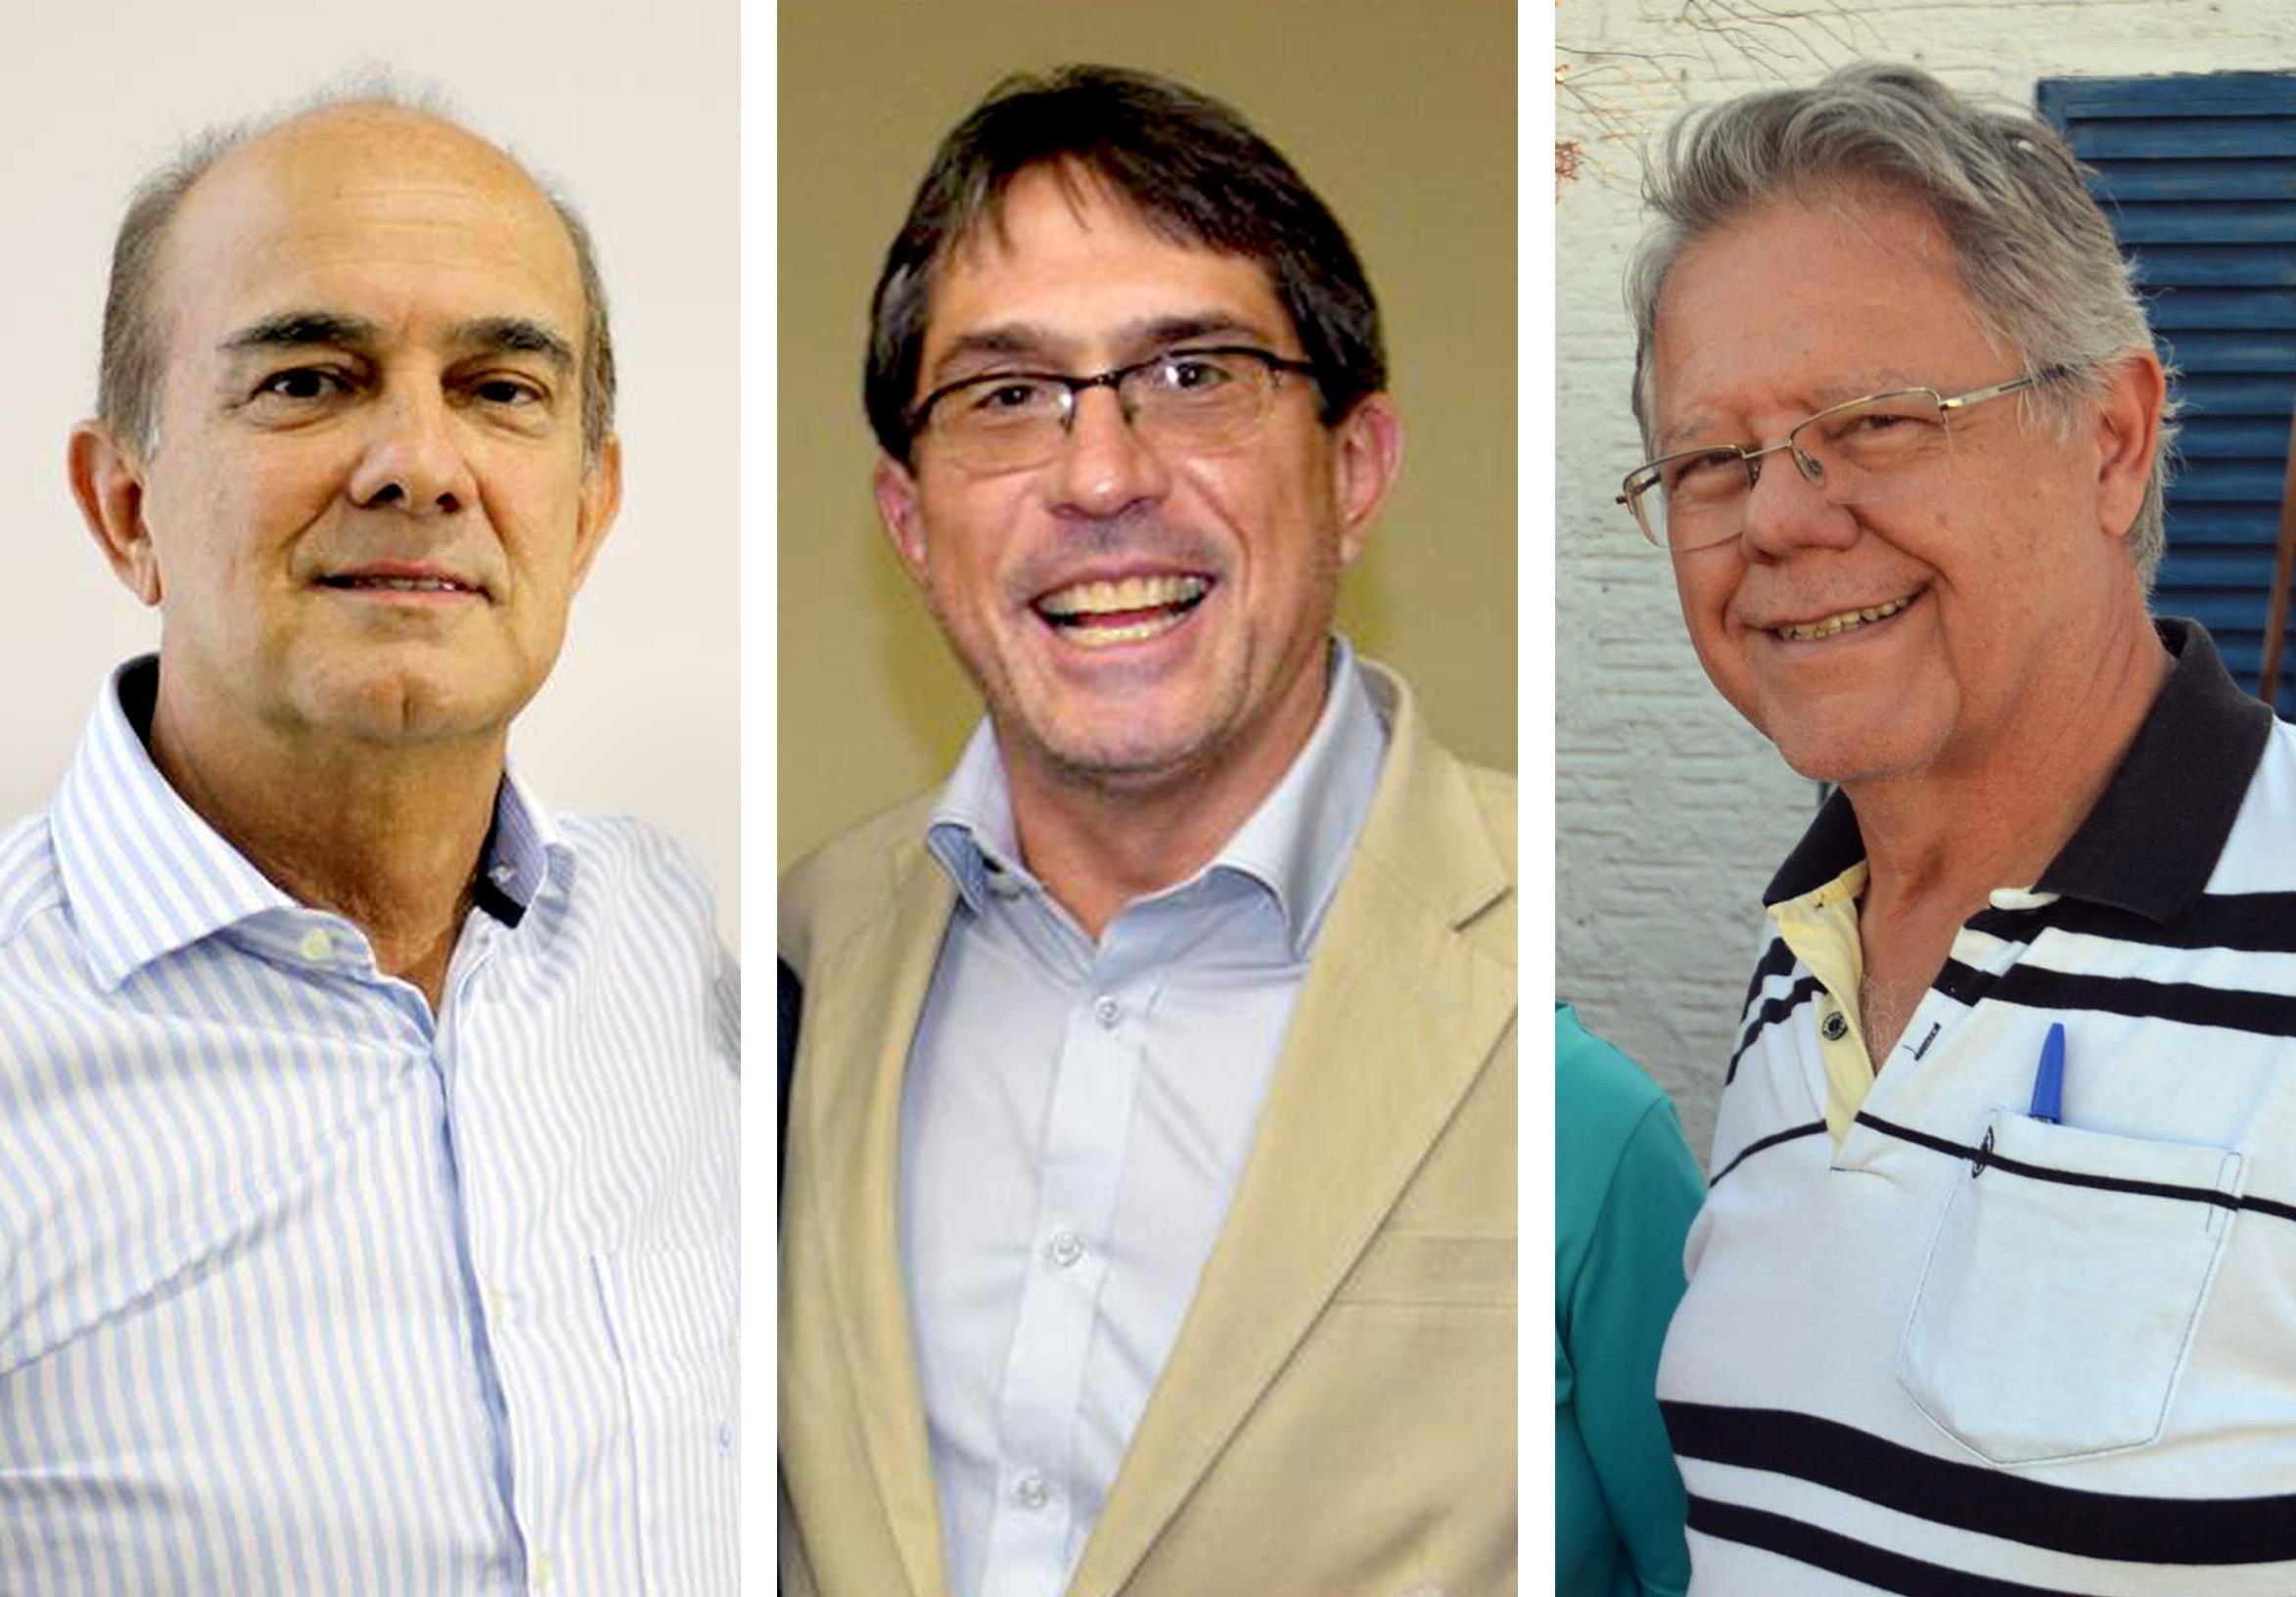 Candidatos a prefeito de Lorena, Ballerini, Marcondes e Vieira, que devem se enfrentar no primeiro debate realizado na cidade (Foto: Arquivo Atos)